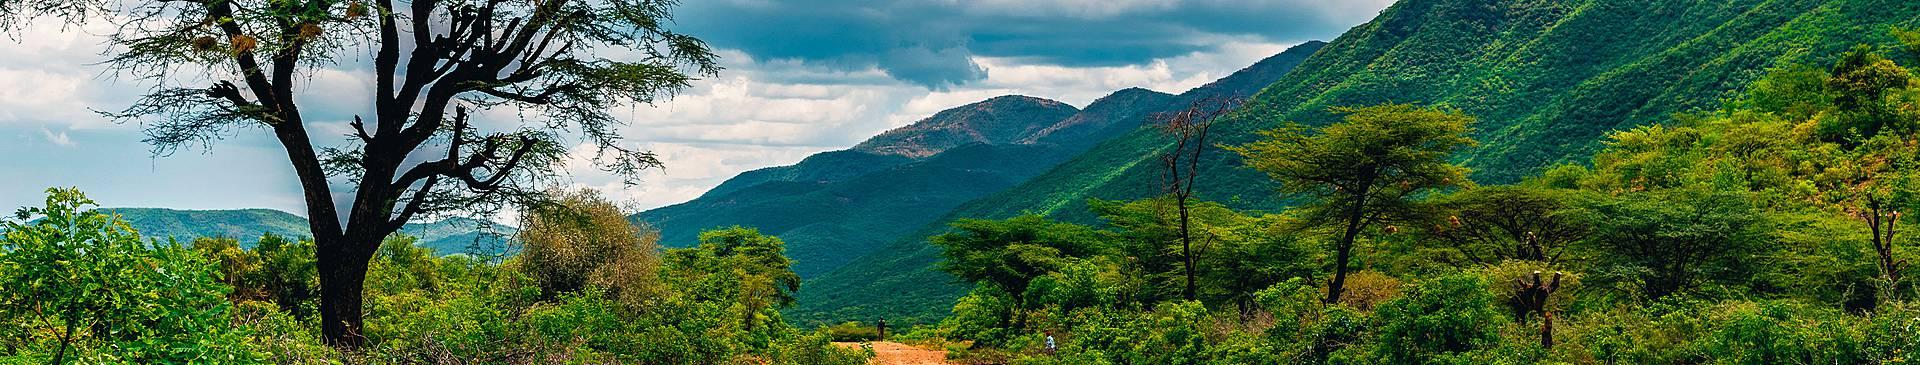 Naturreisen Kenia